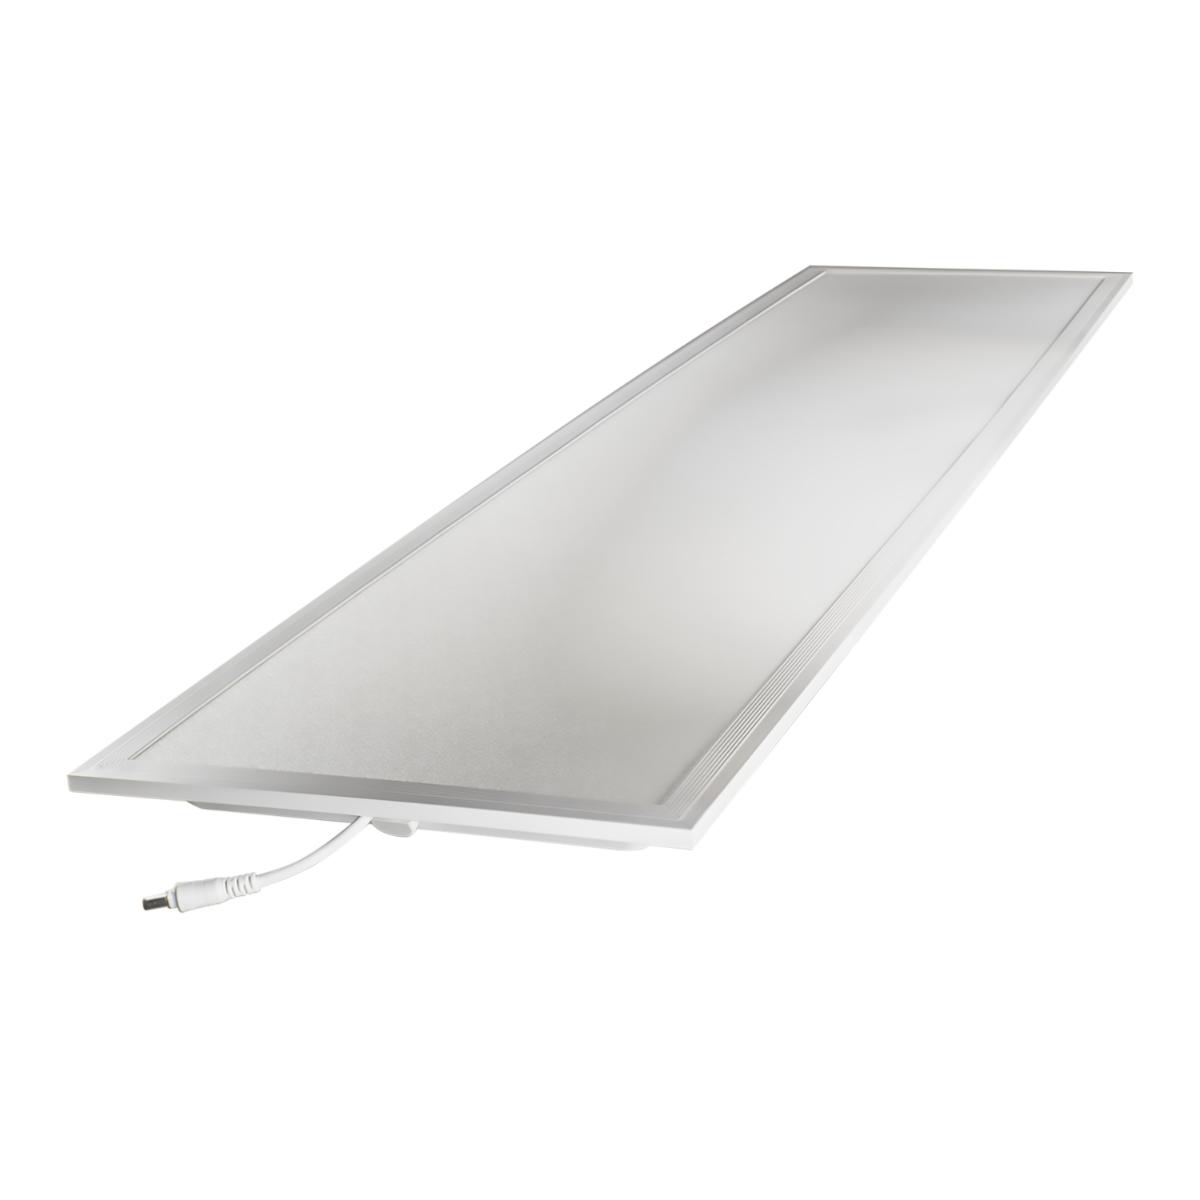 Noxion LED panel Econox 32W Xitanium DALI 30x120cm 6500K 4400lm UGR <22 | Dali dæmpbar - dagslys - erstatter 2x36W